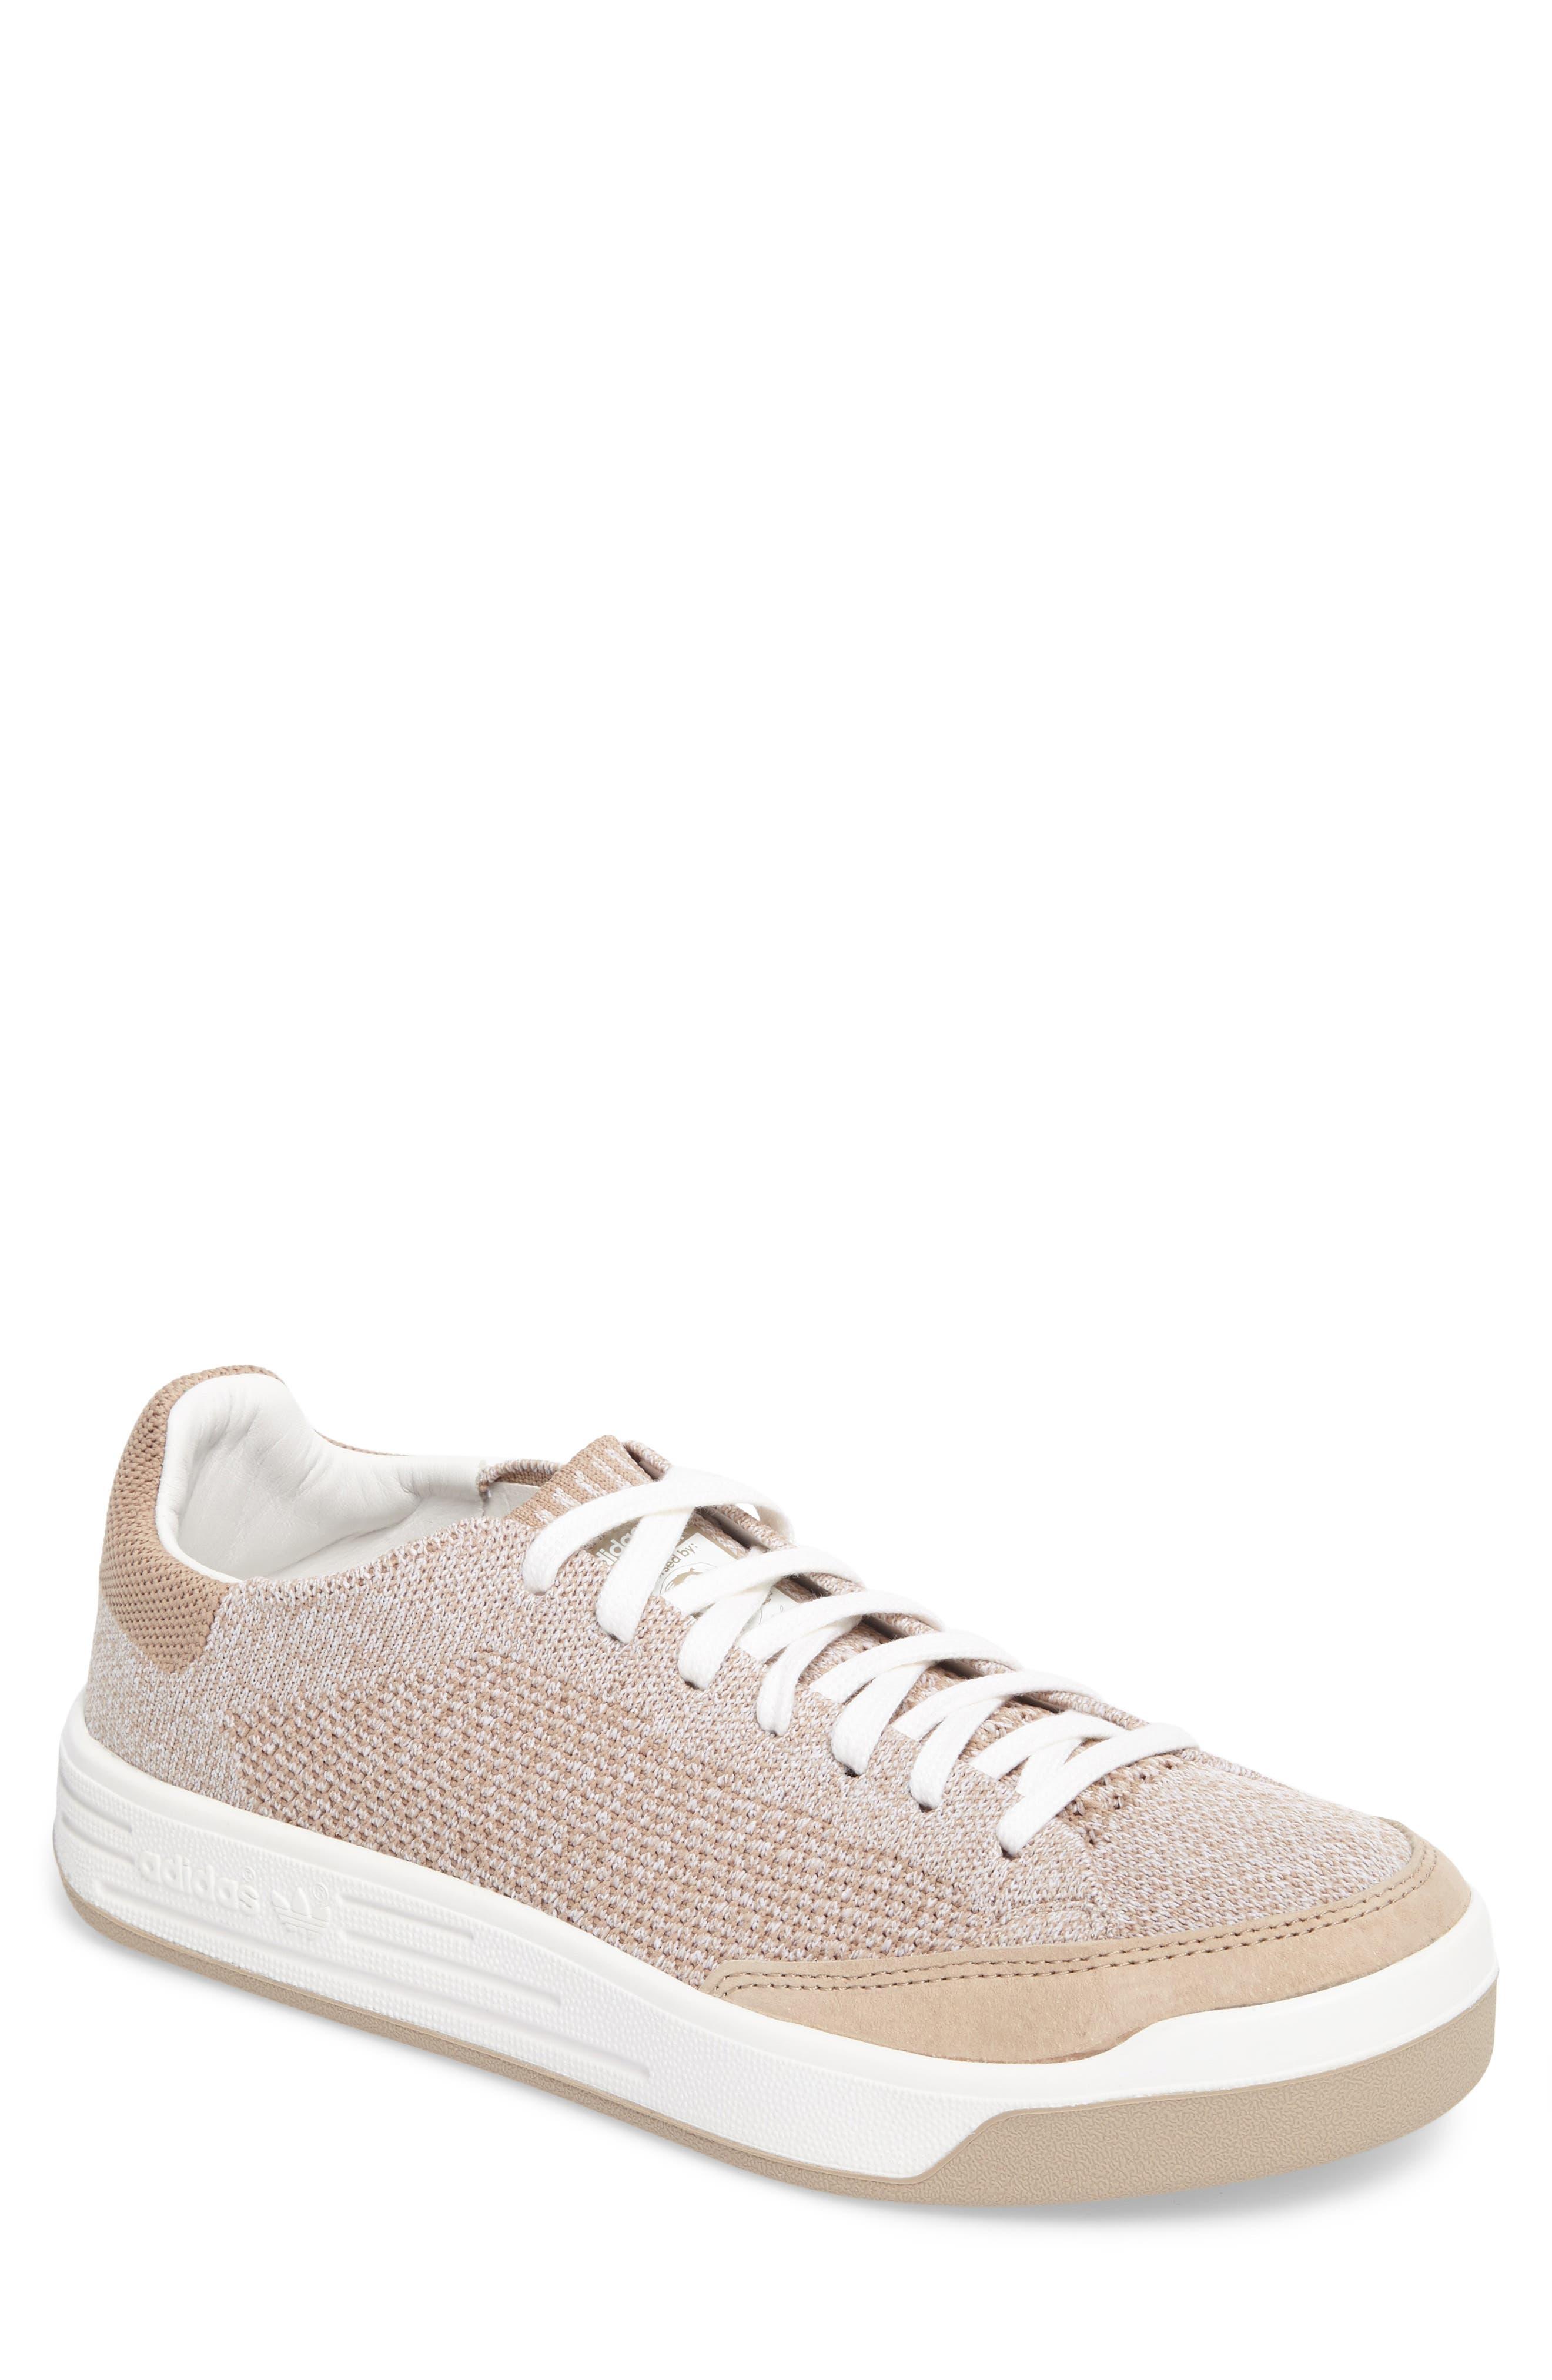 adidas Rod Laver Super Primeknit Sneaker (Men)